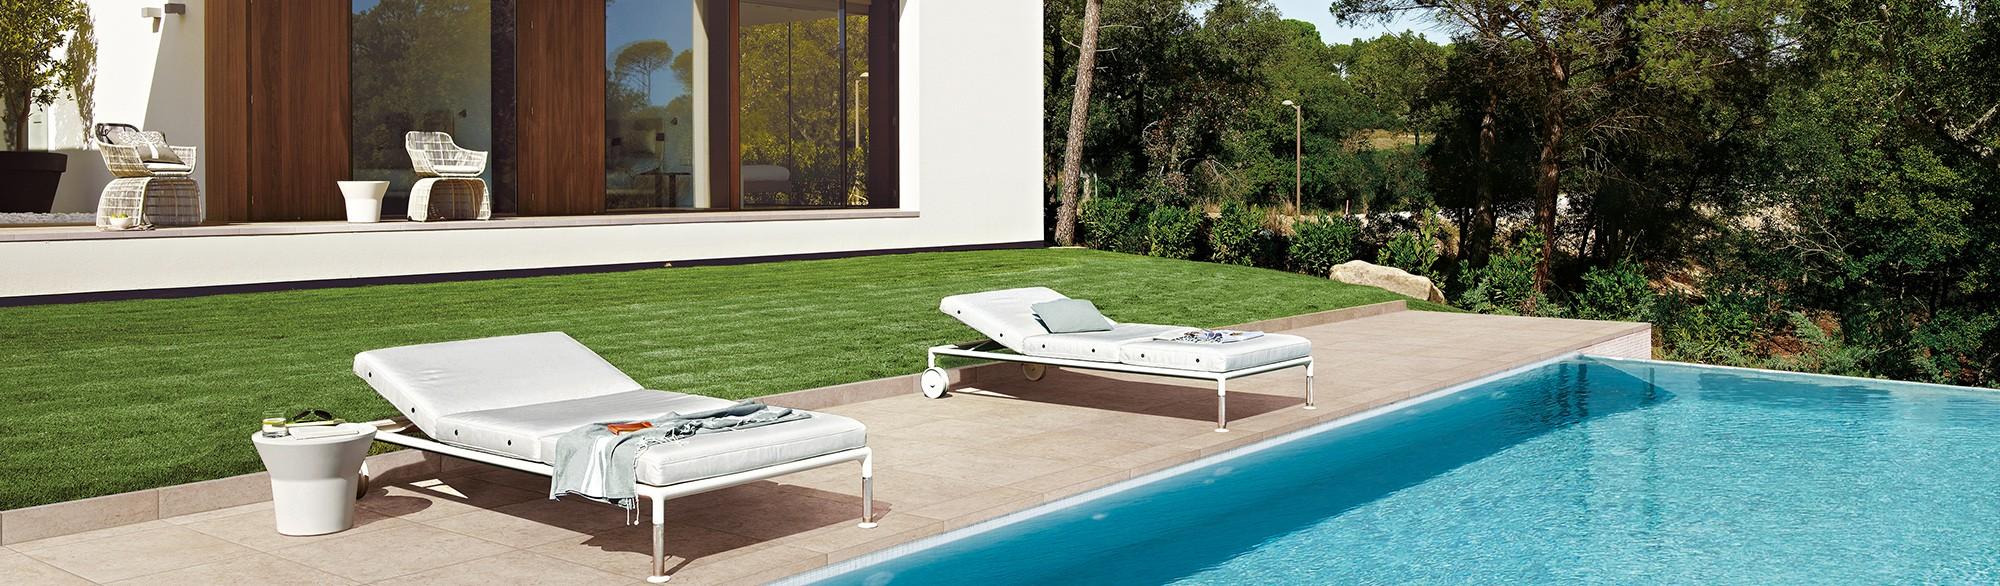 penez herman am nagement ext rieur jardin terrasse cloture. Black Bedroom Furniture Sets. Home Design Ideas